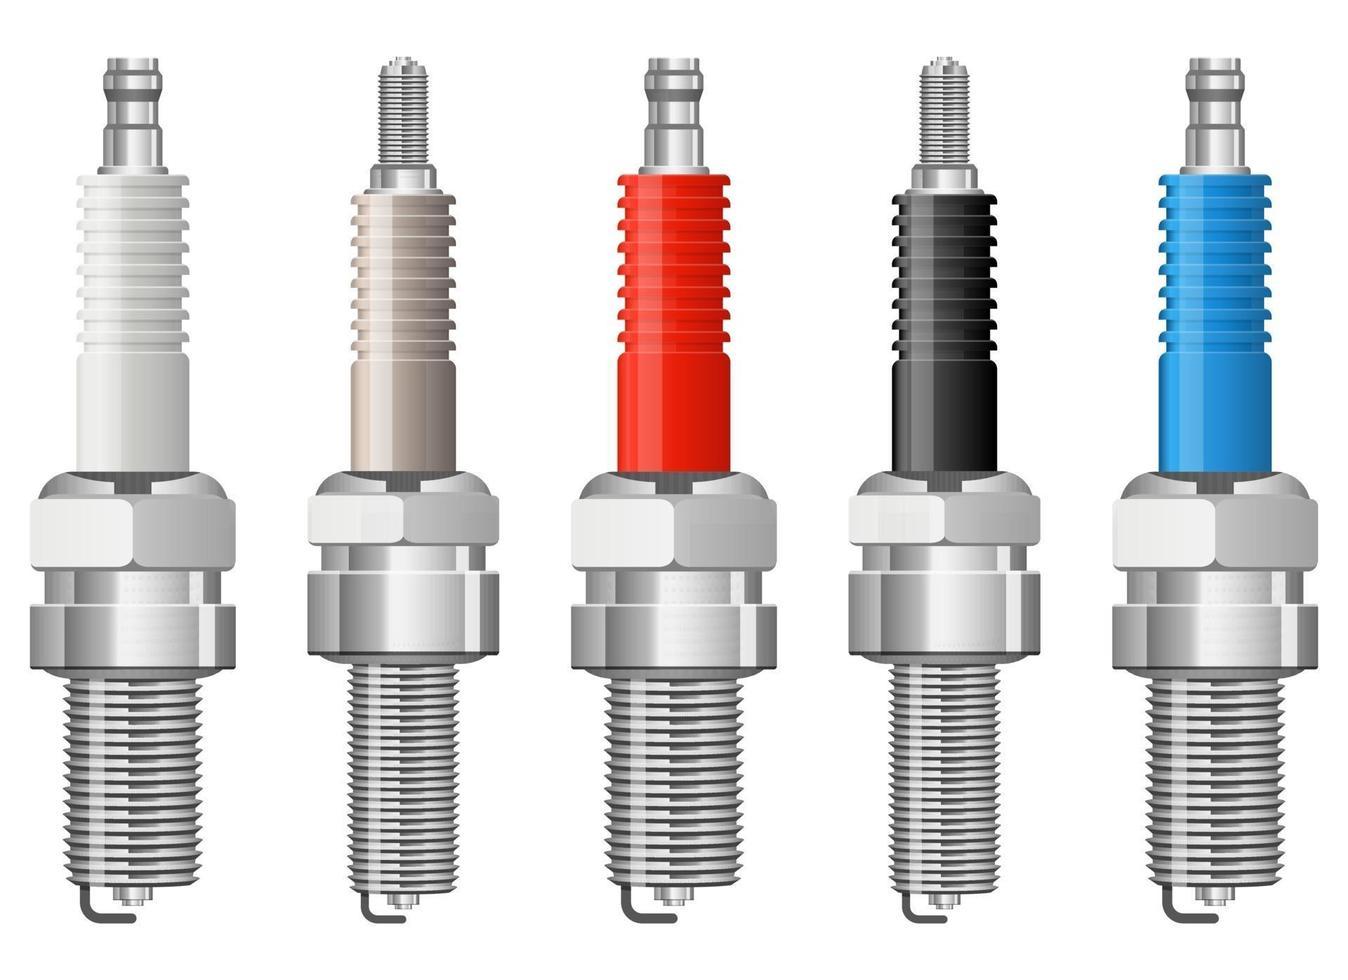 Spark plug vector design illustration set isolated on white background